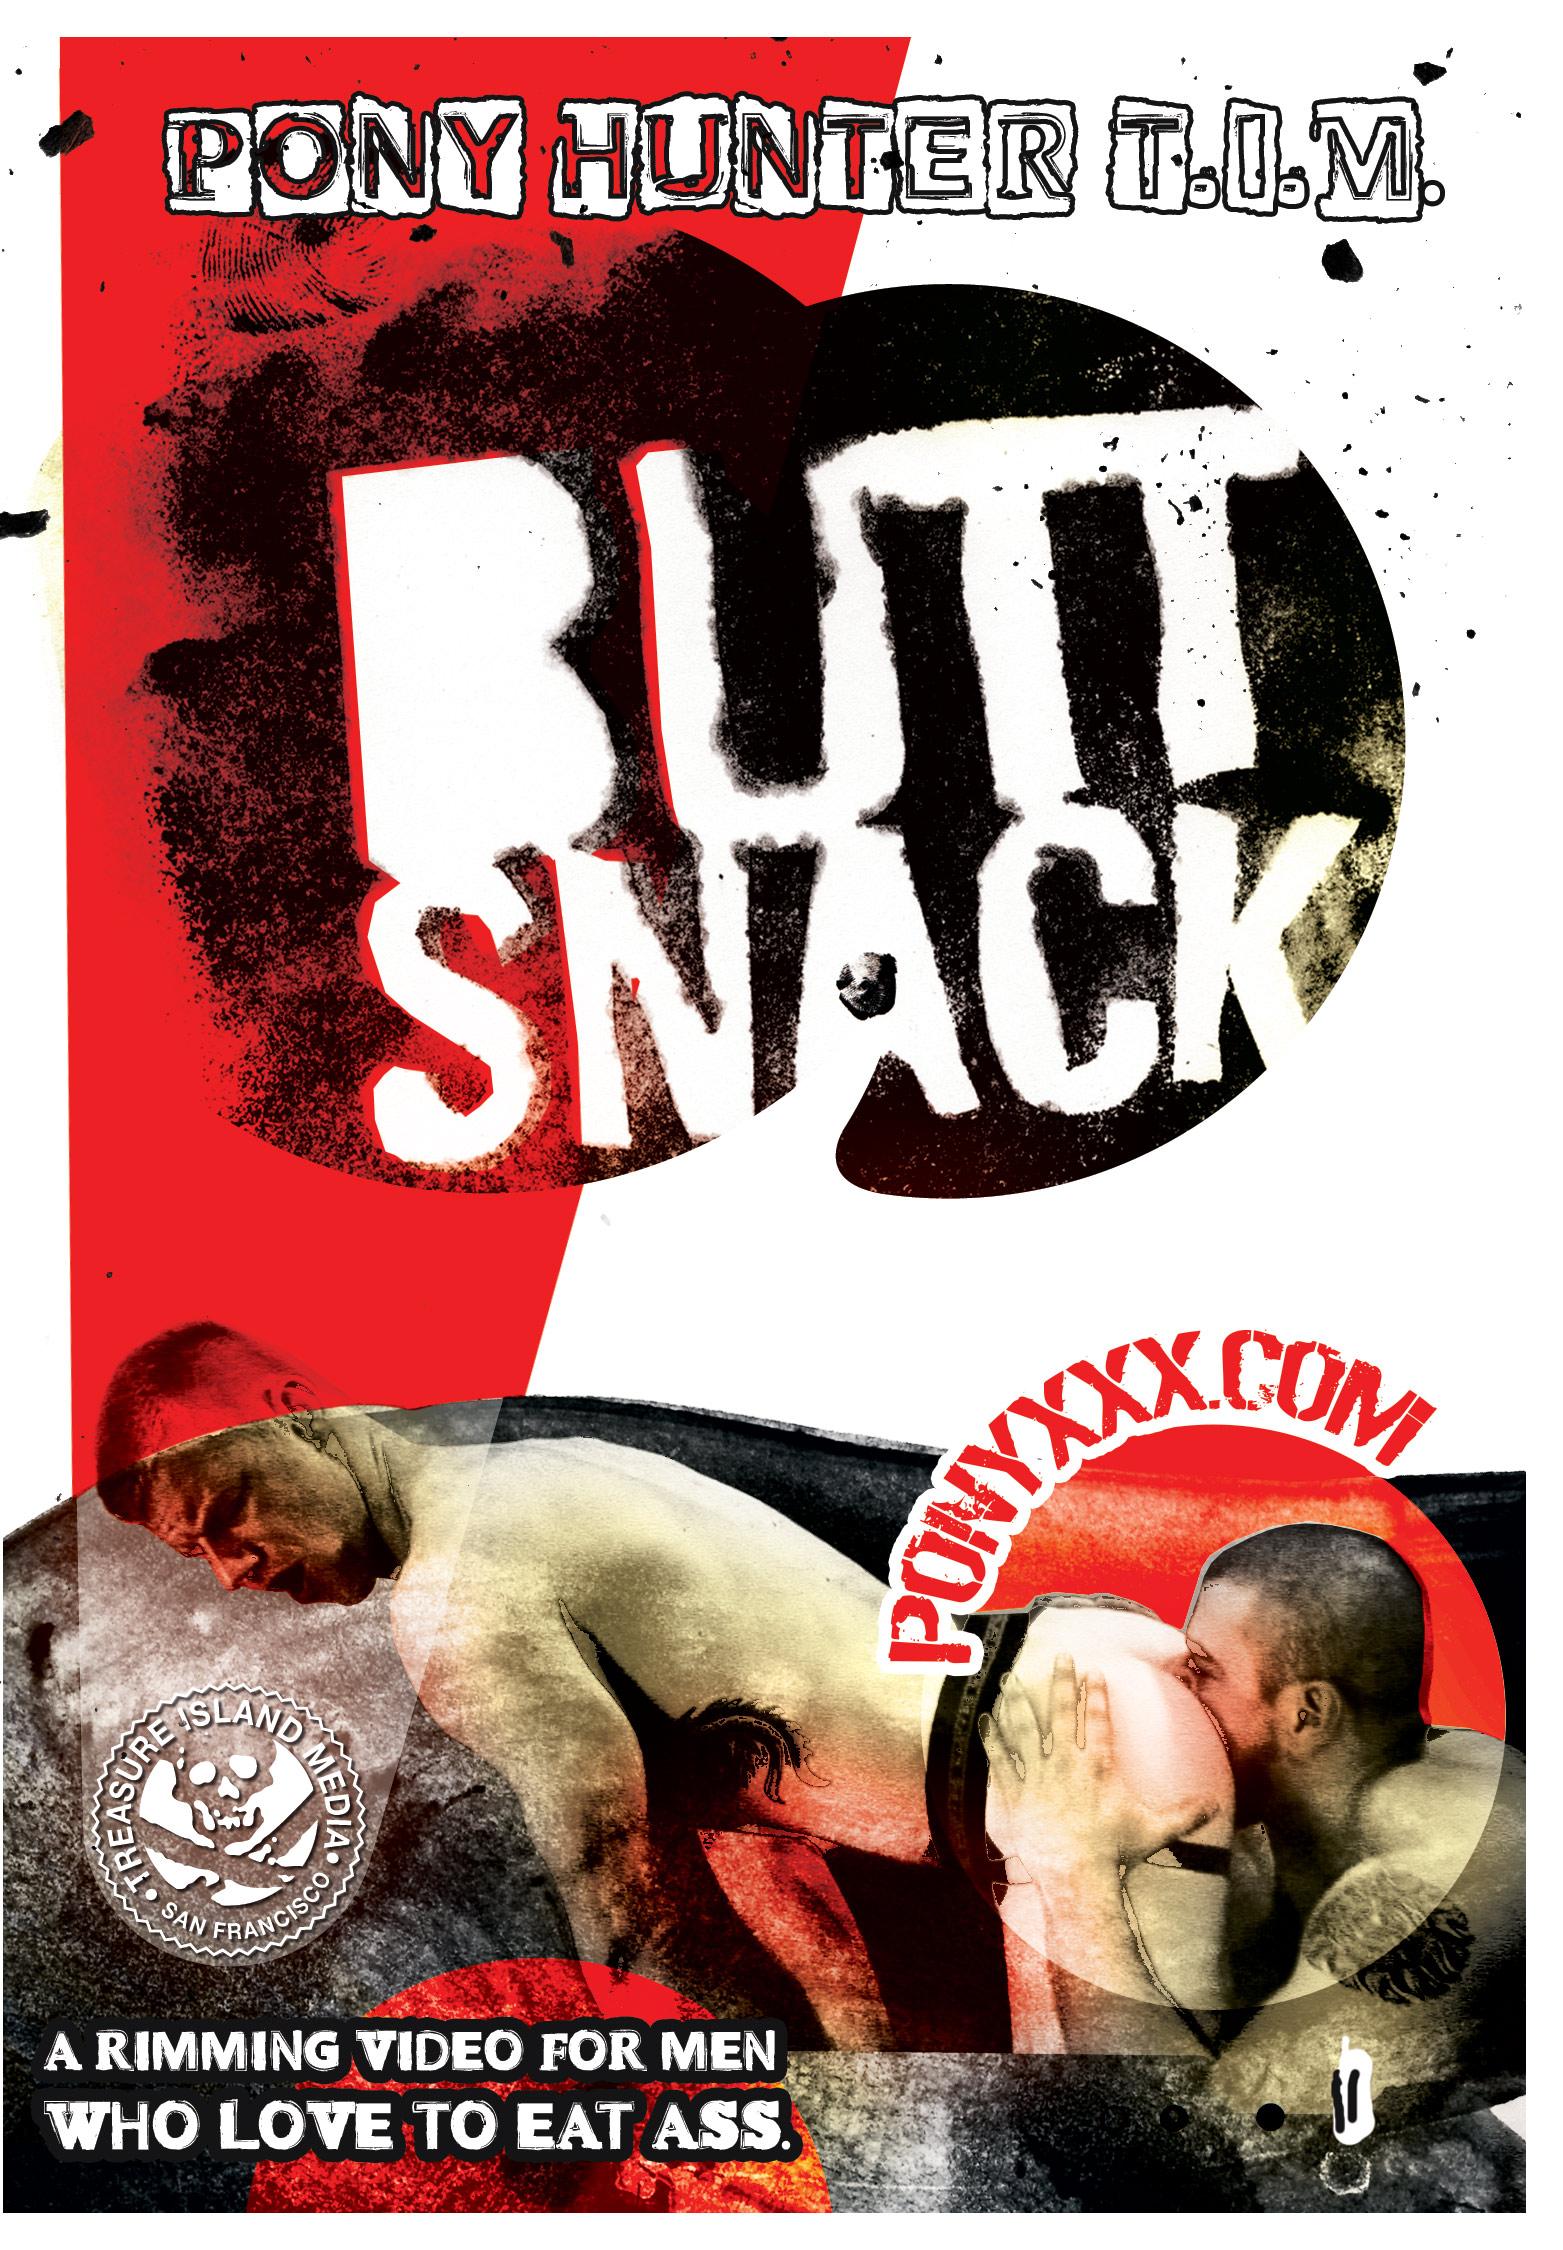 BUTT SNACK - SCENE 01 - FIRST SCENE